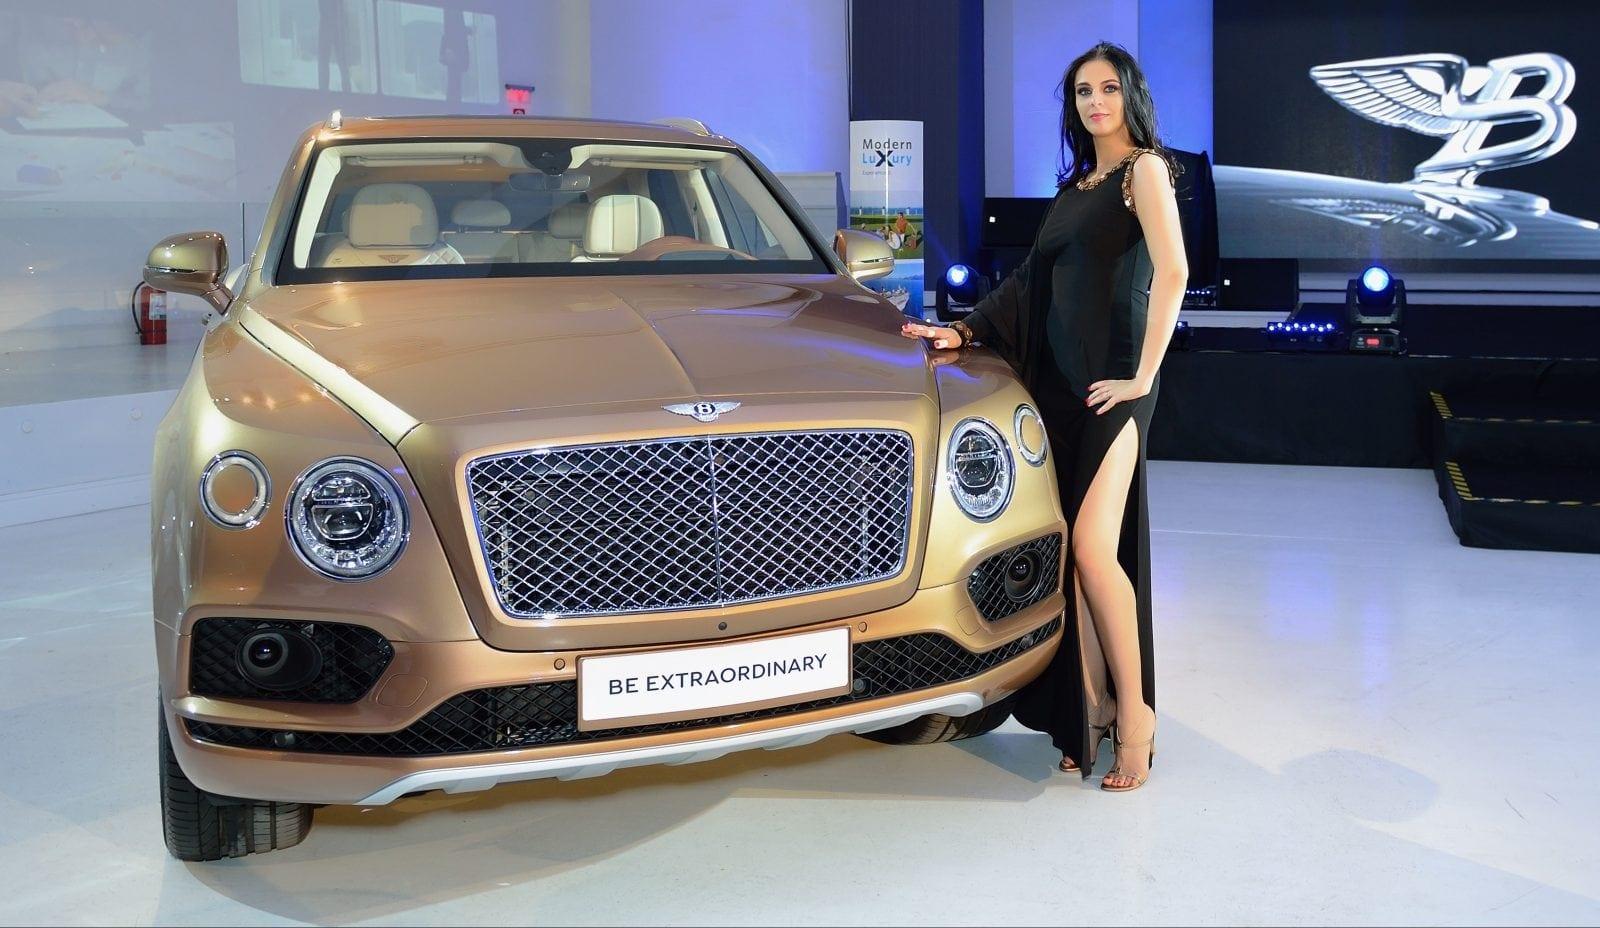 Mihaela Tudorica brand manager Bentley e1464695700377 - Bentley Bentayga – Momentul zero în România